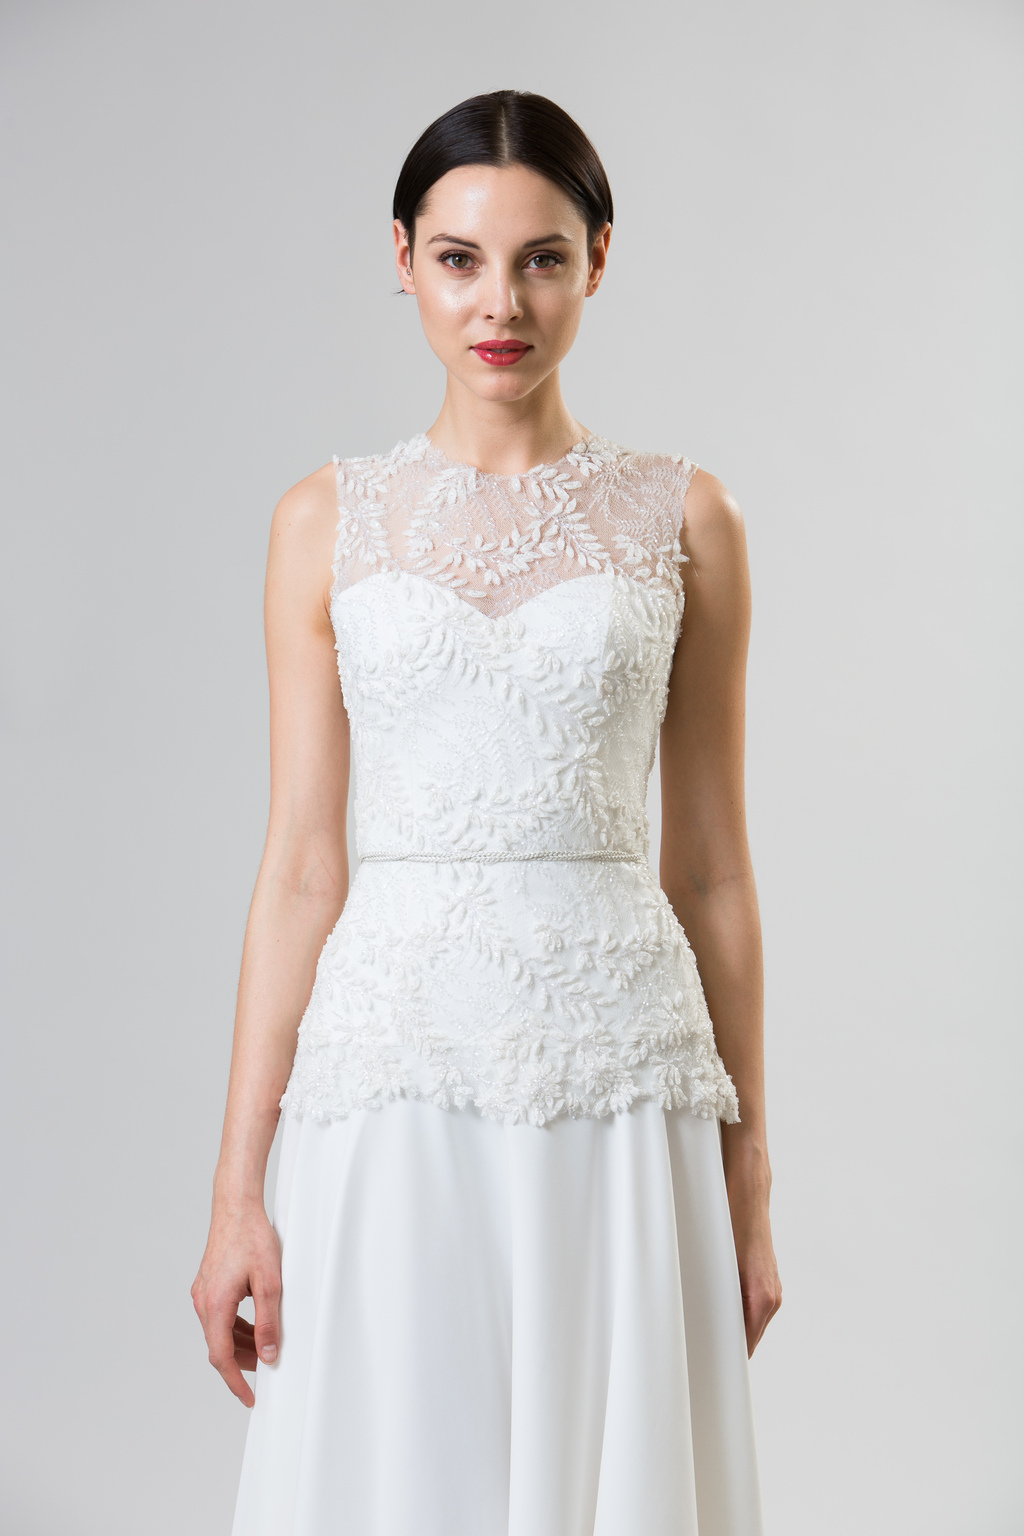 Junko-yoshioka-summer-spring-2014-wedding-dress-macaroon_2.full